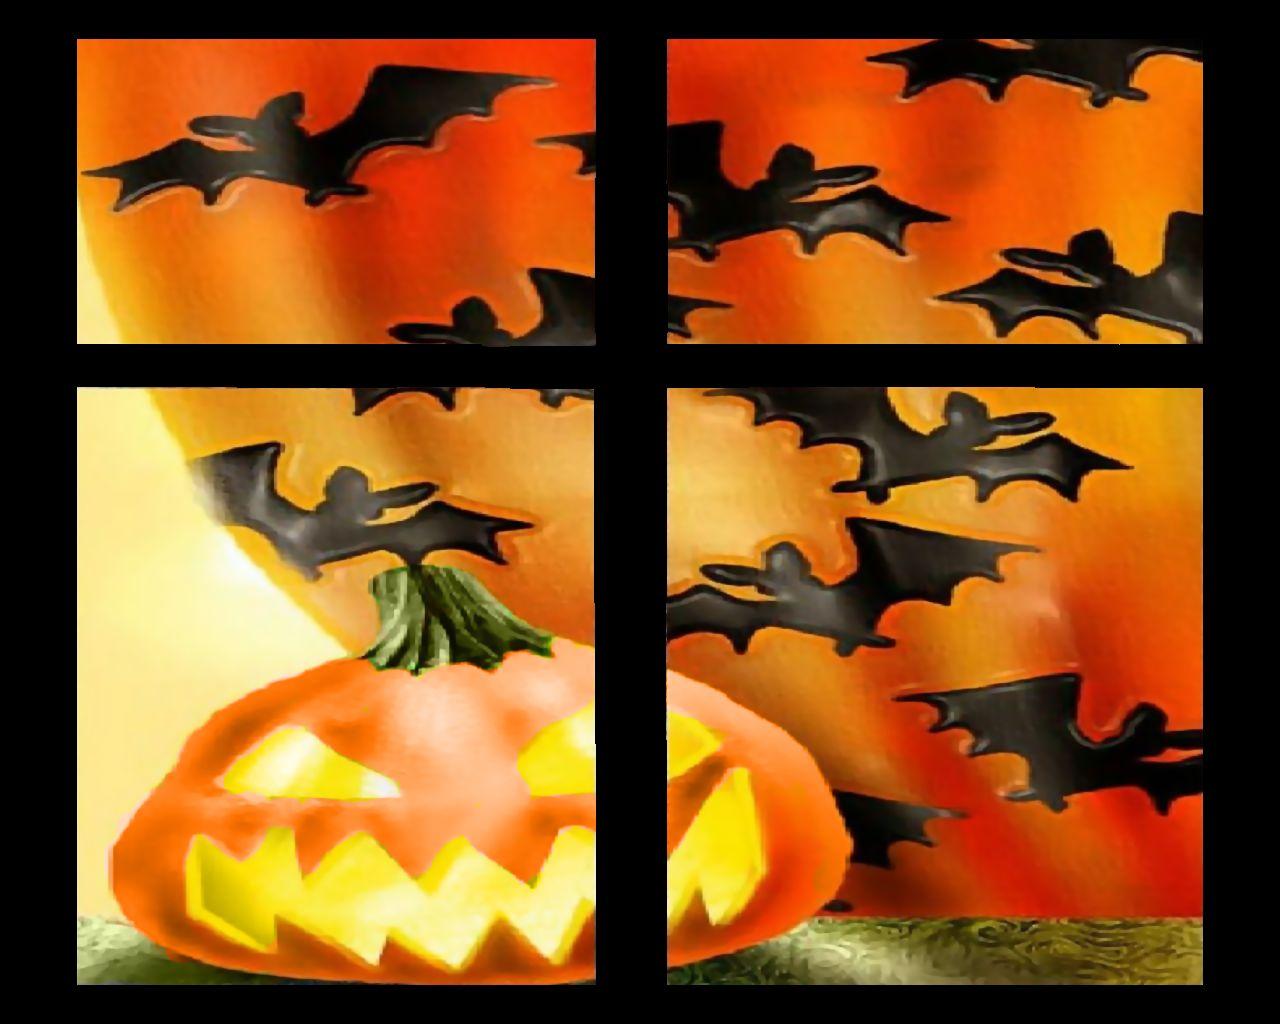 free collection of Animated Halloween Desktop Wallpaper to let desktop 1280x1024